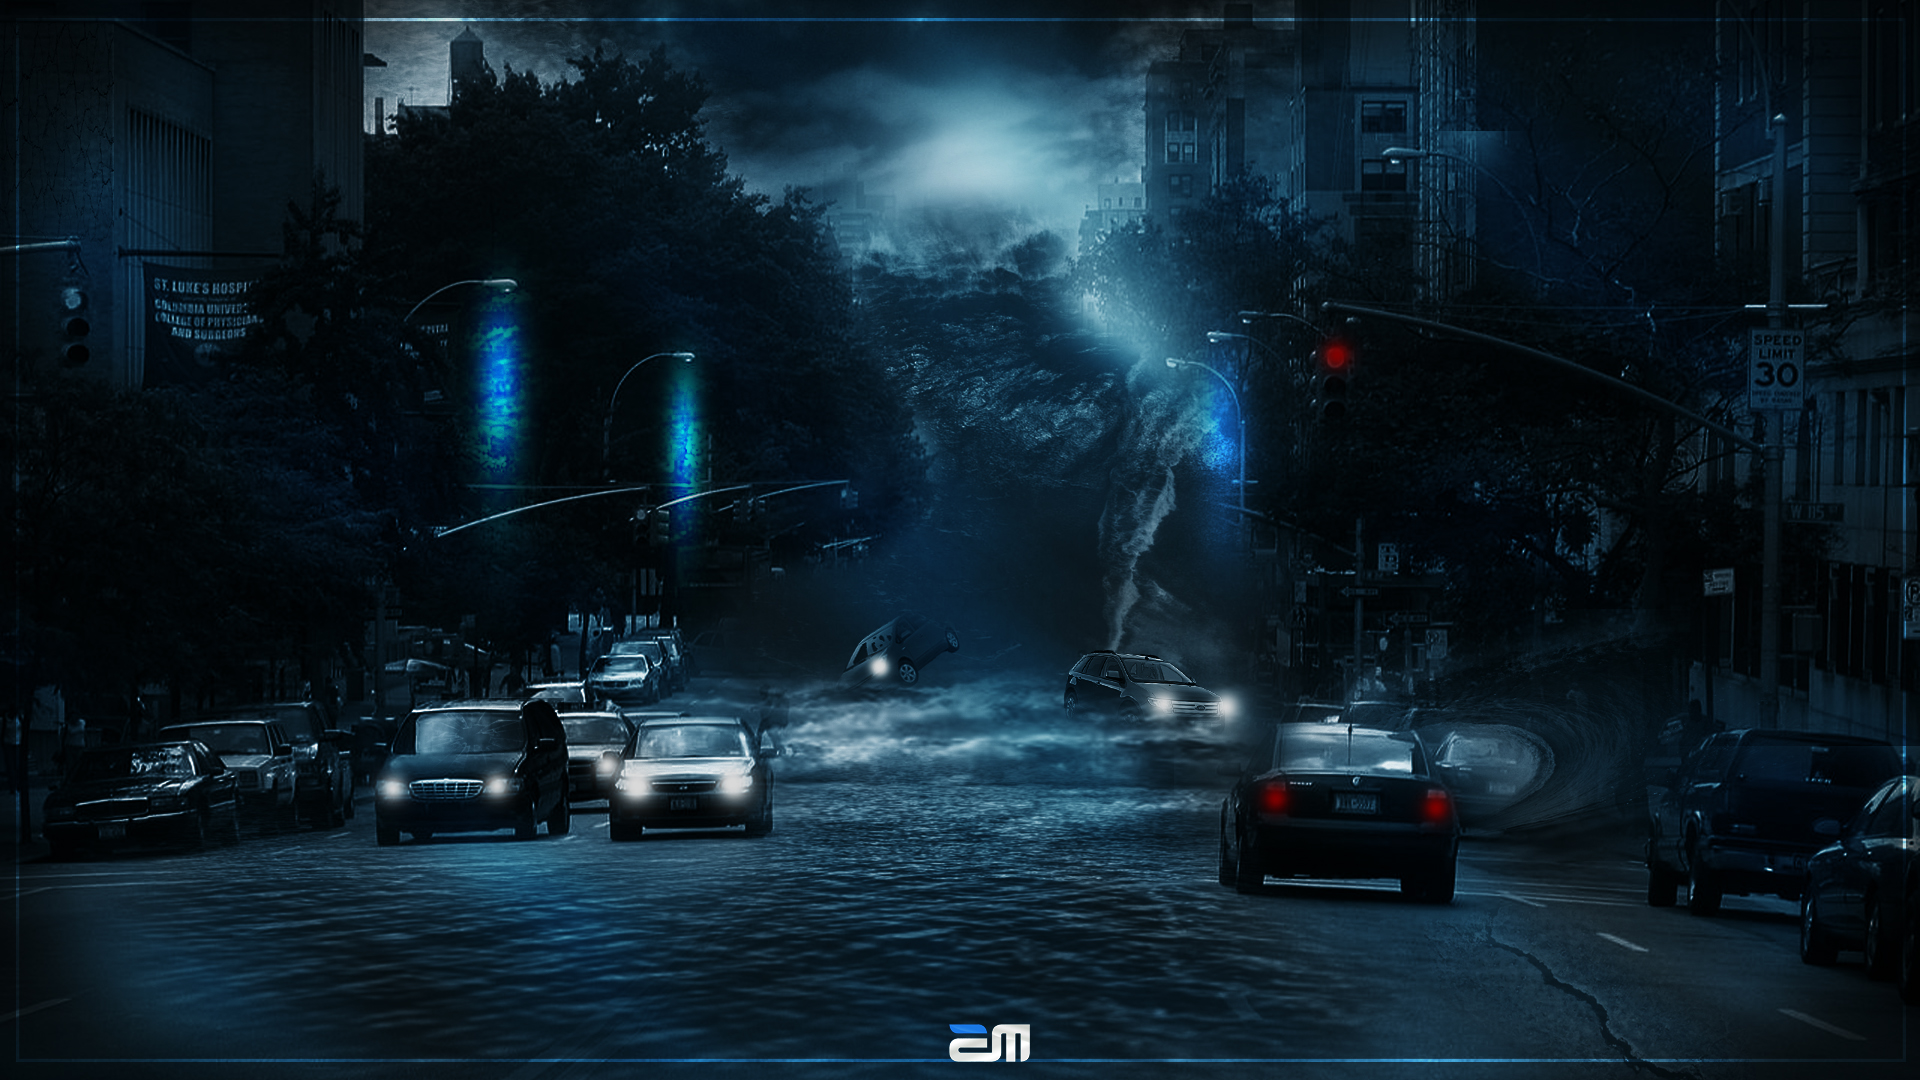 New York Tsunami photomanipulation by emartworks